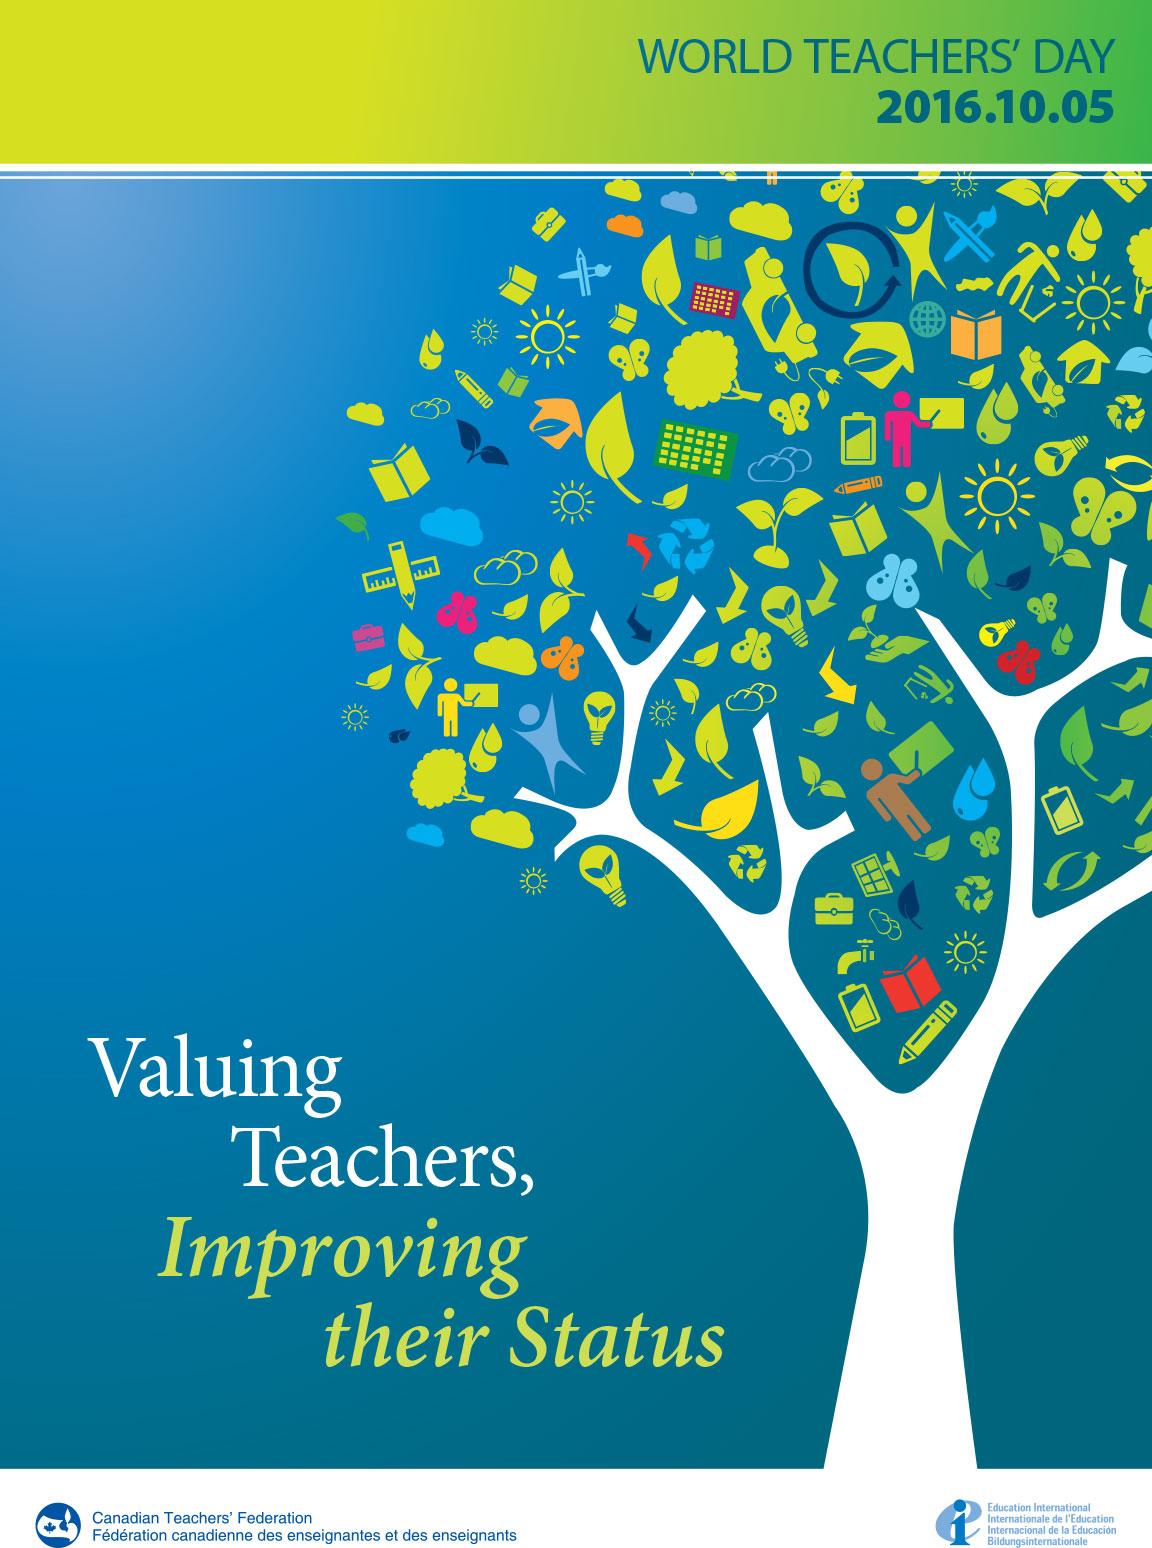 YCDSB celebrates World Teachers' Day, October 5th